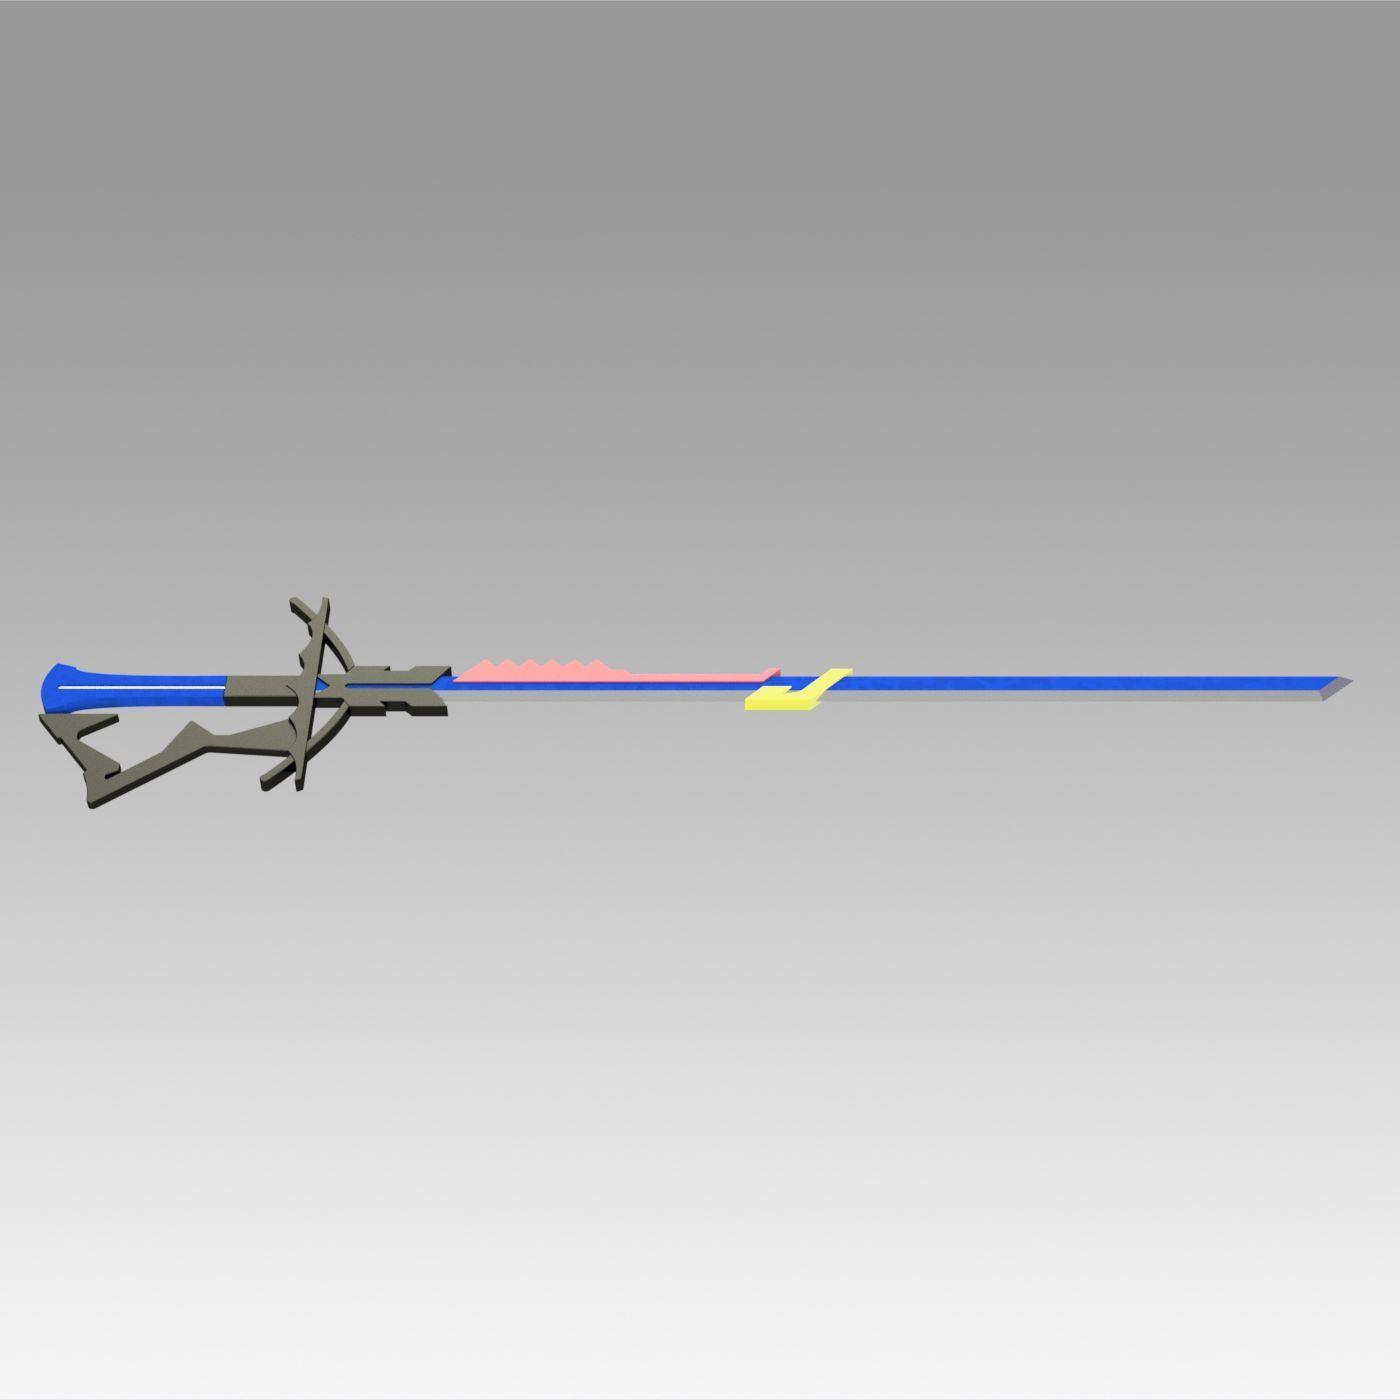 3.jpg Download OBJ file Arknights Astesia Epoque Sword Cosplay Weapon Prop  • 3D printable template, Blackeveryday